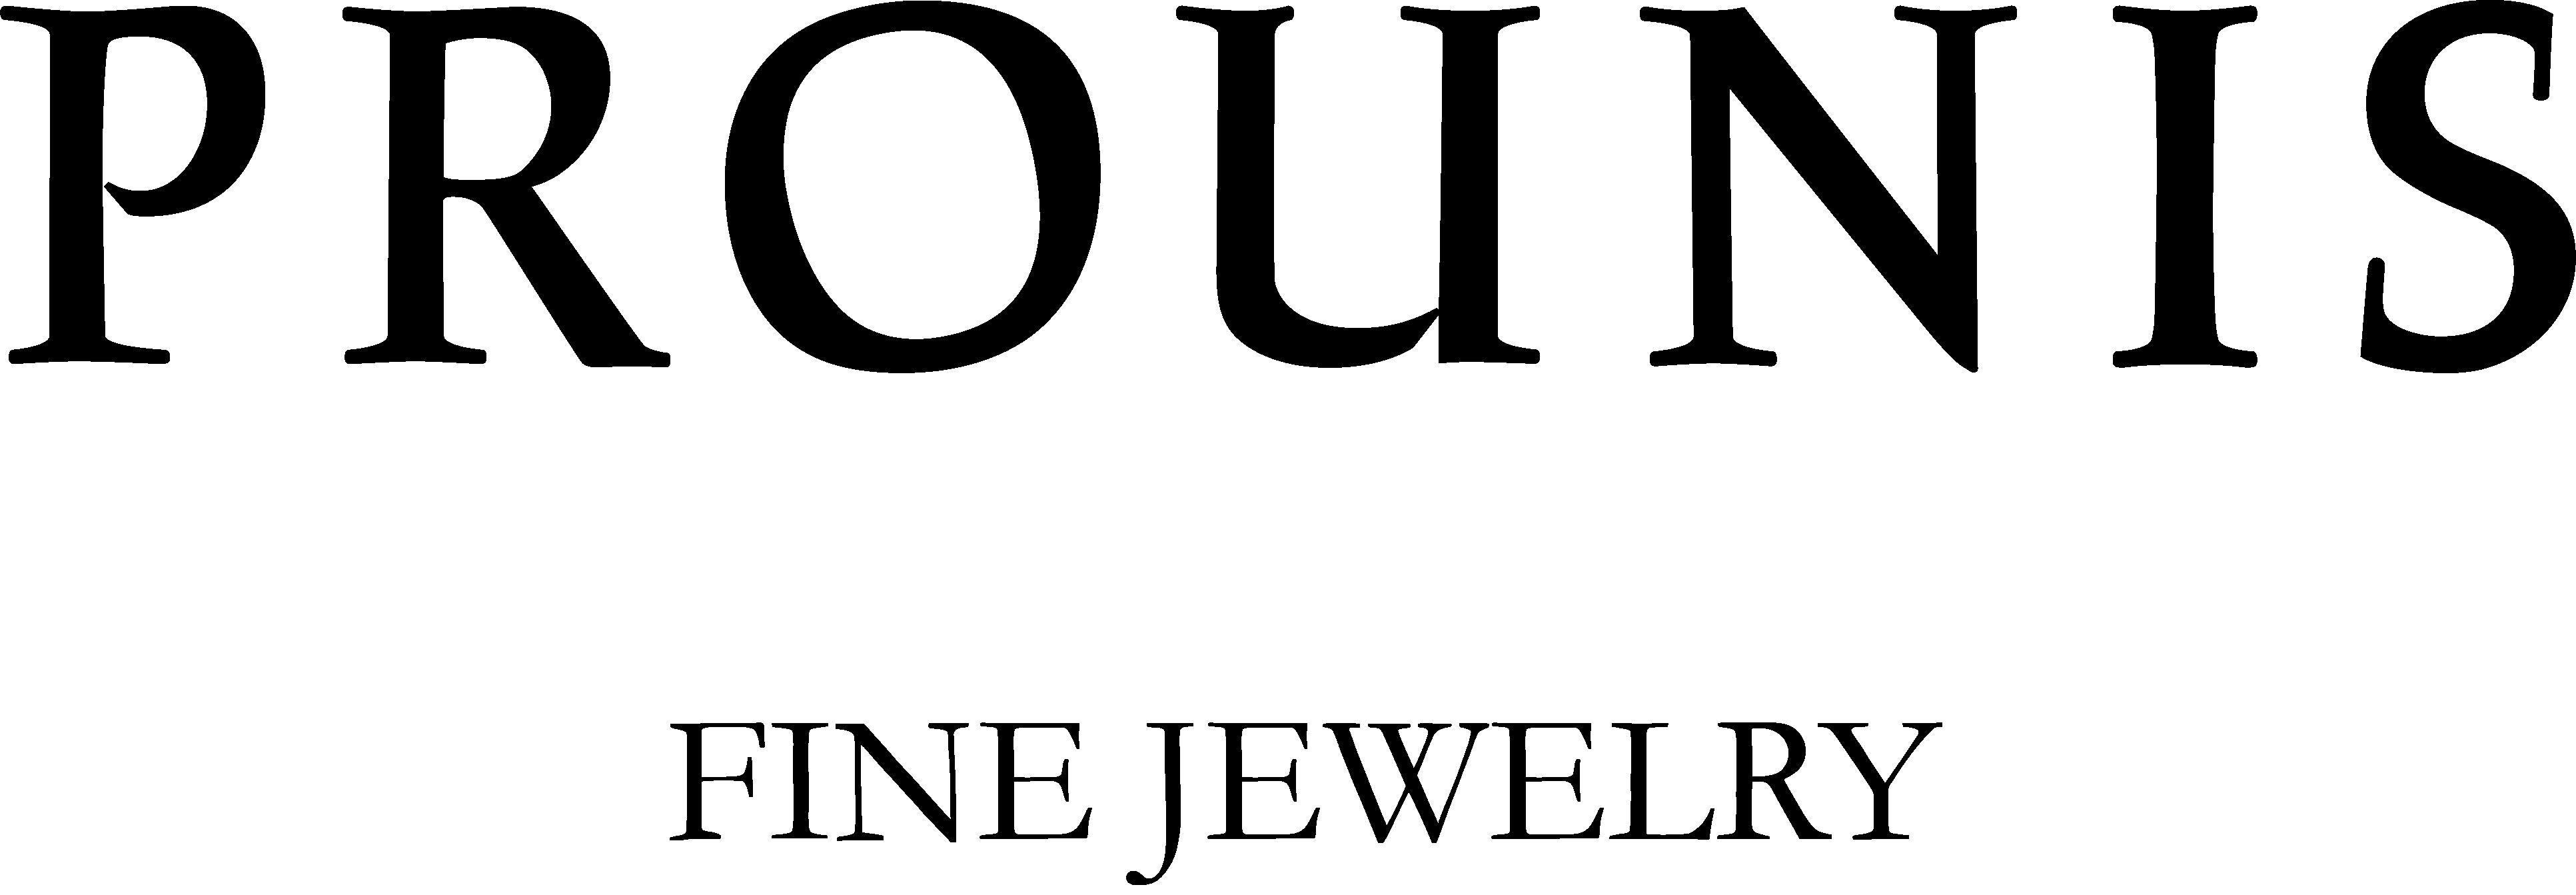 Prounis Jewelry Logo Image